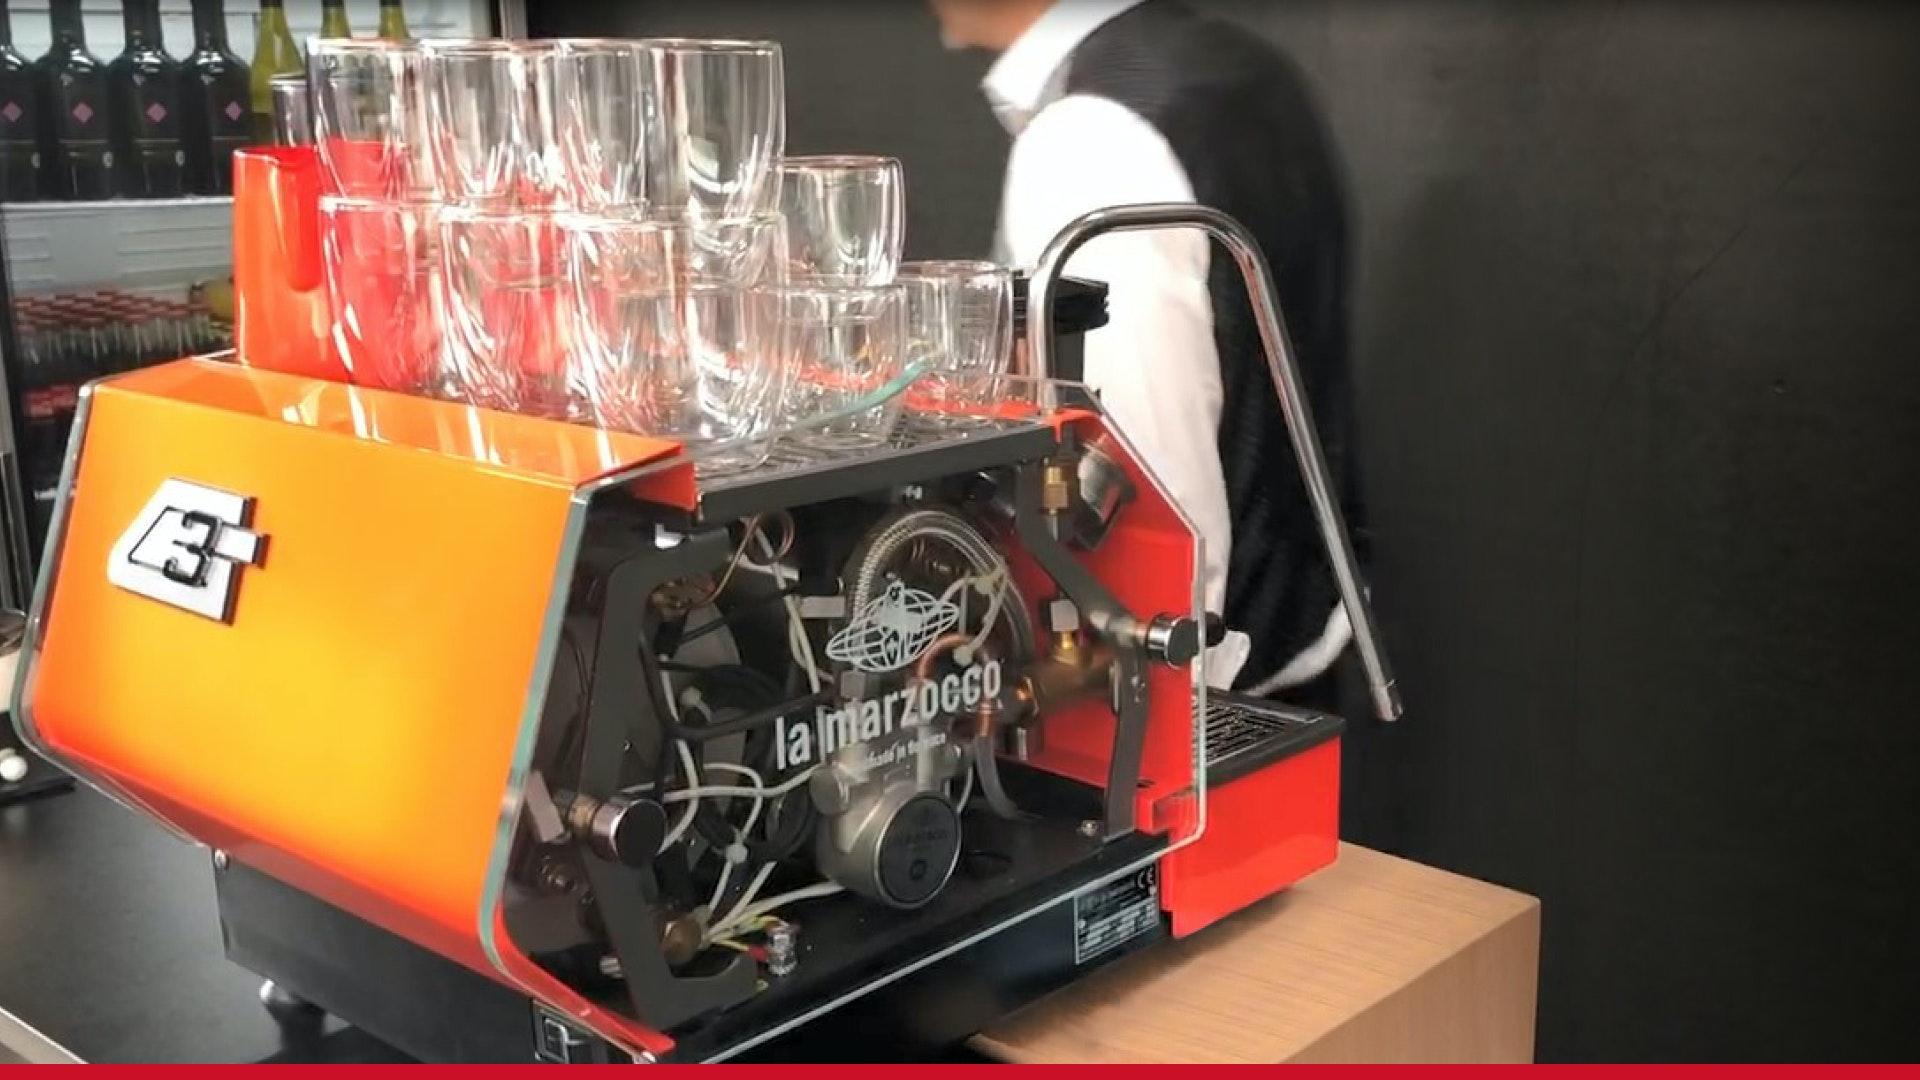 V1 202109 Apostore Lager Roboter Digitale Apotheke austropharm2 2 Barista